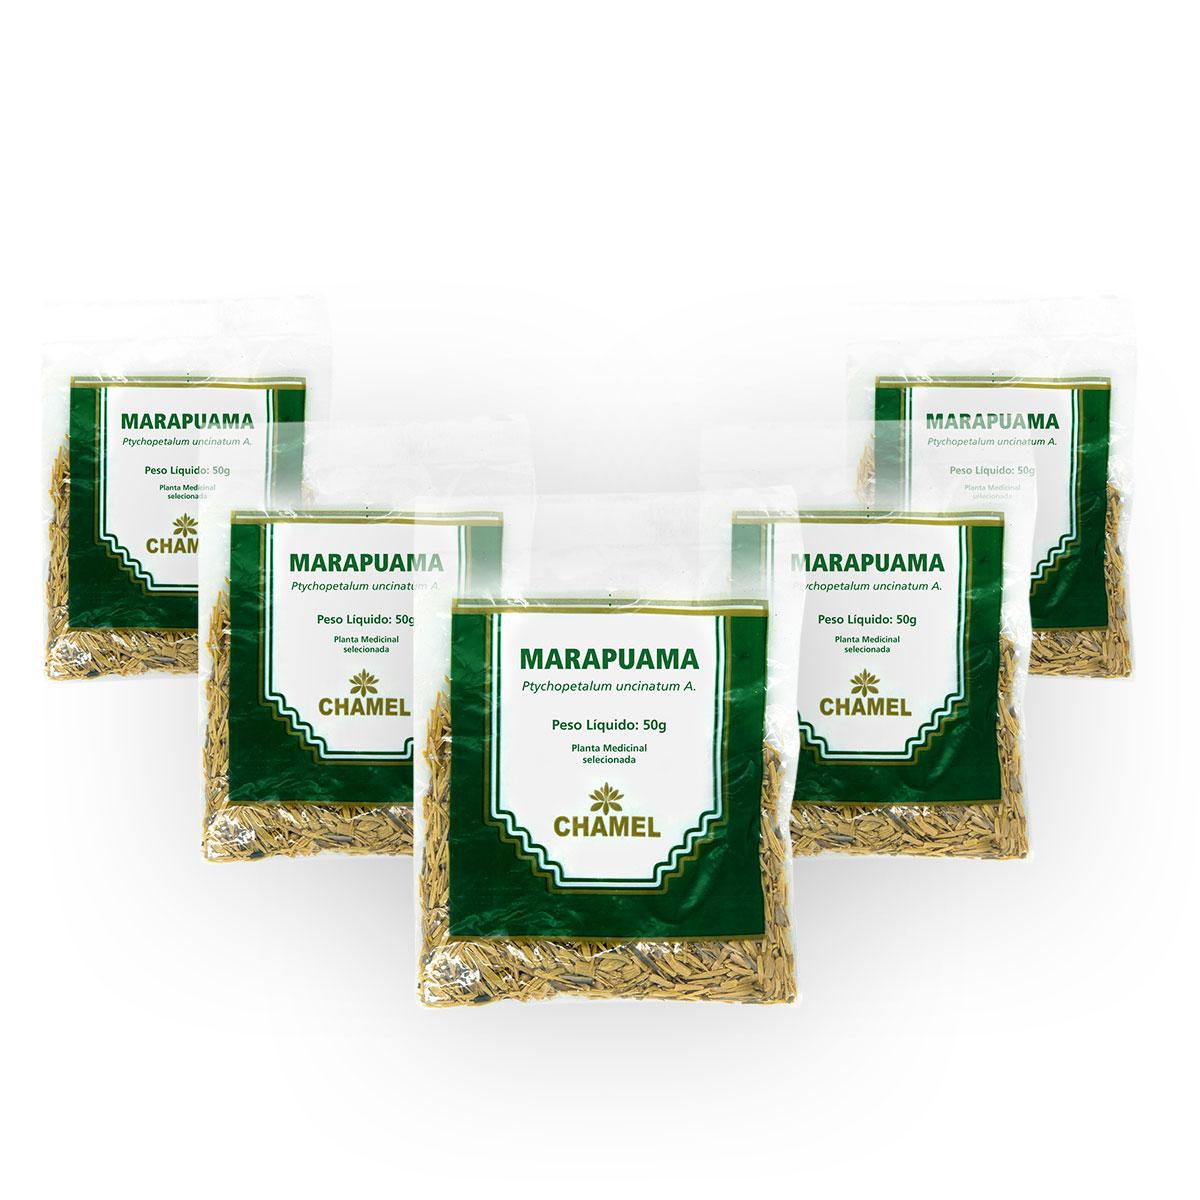 Marapuama 50g Chamel com 5 Unidades - Chá Raízes